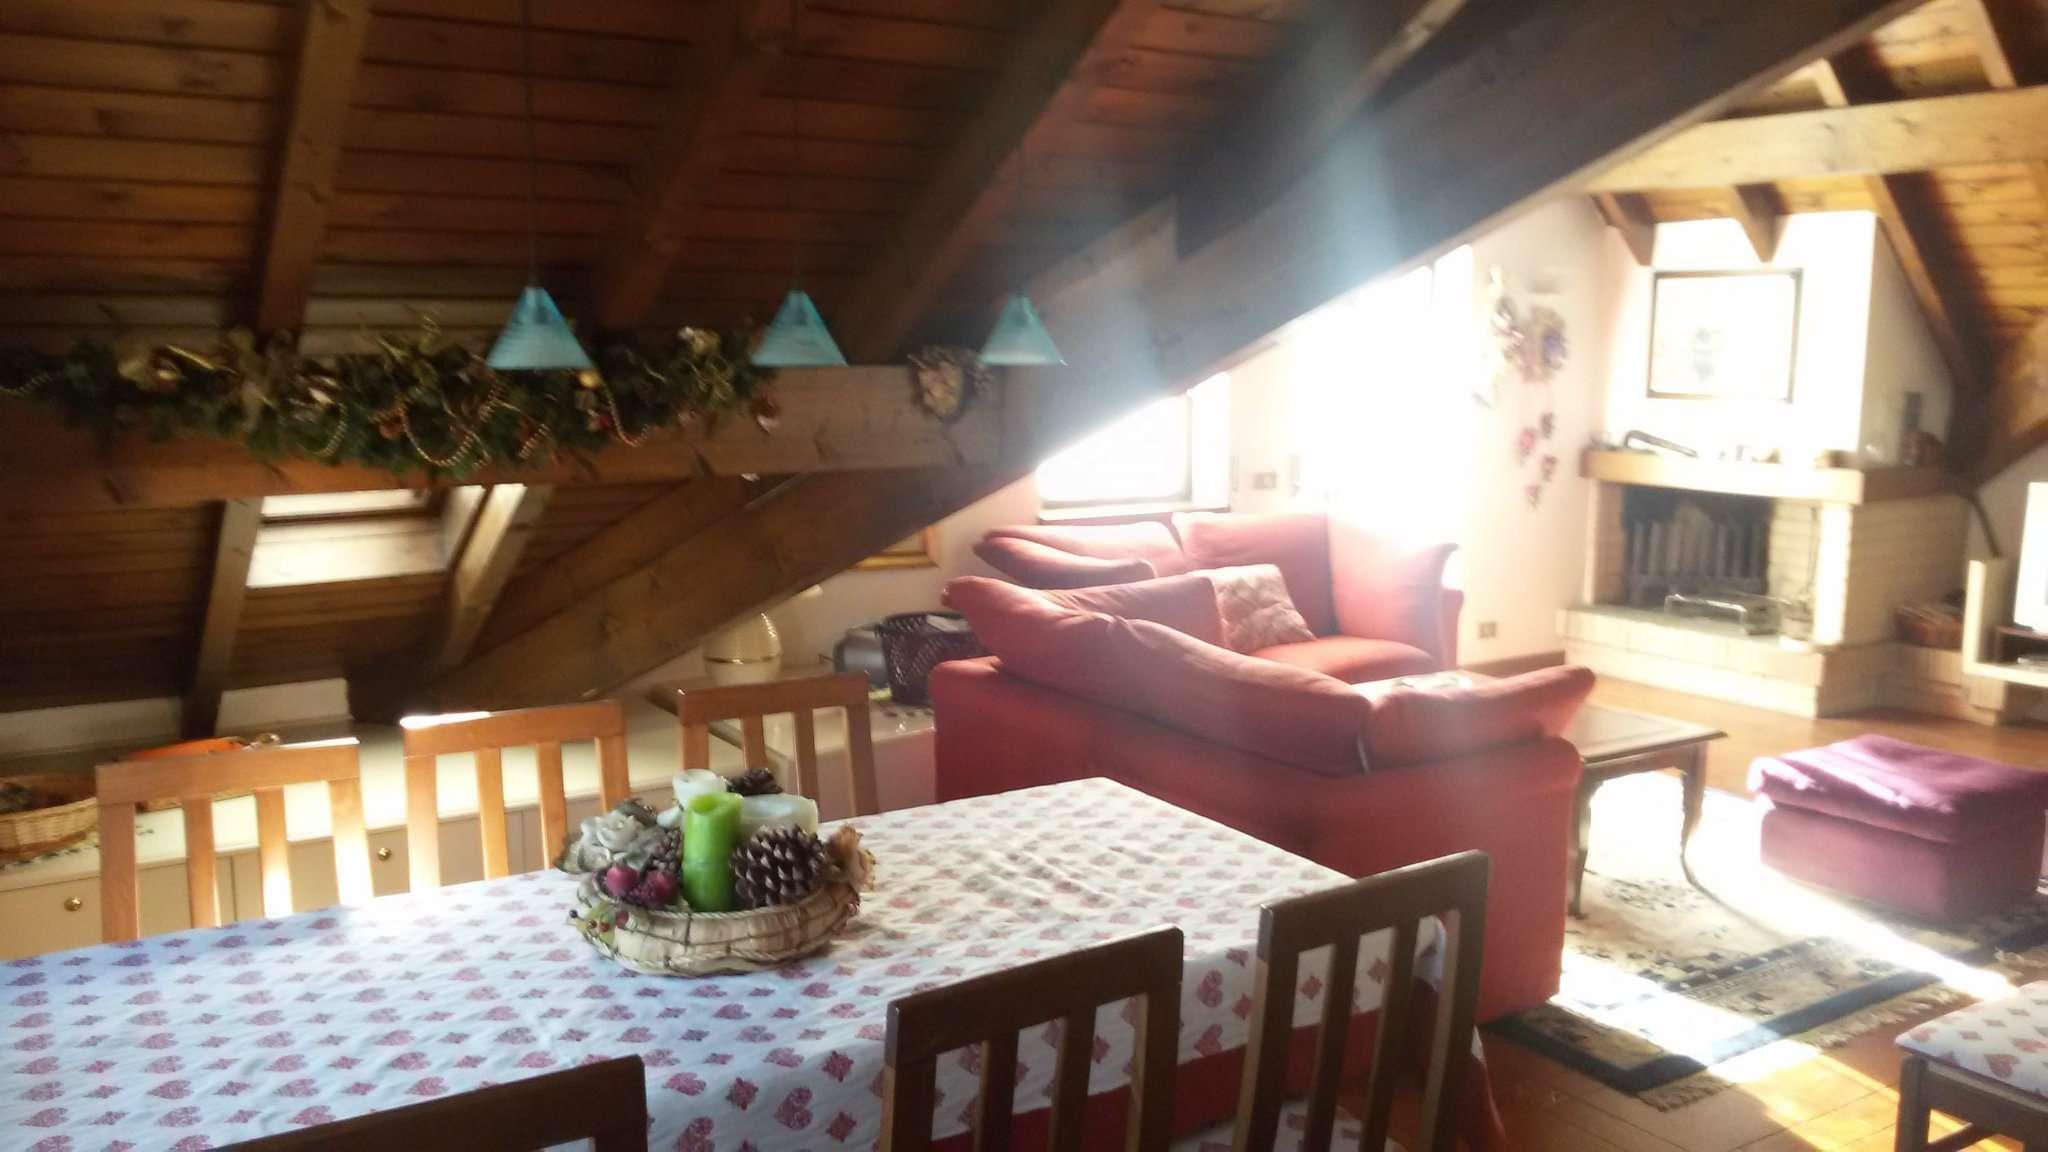 Case vacanza vicenza appartamenti per vacanze vicenza for Asiago appartamenti vacanze prezzi